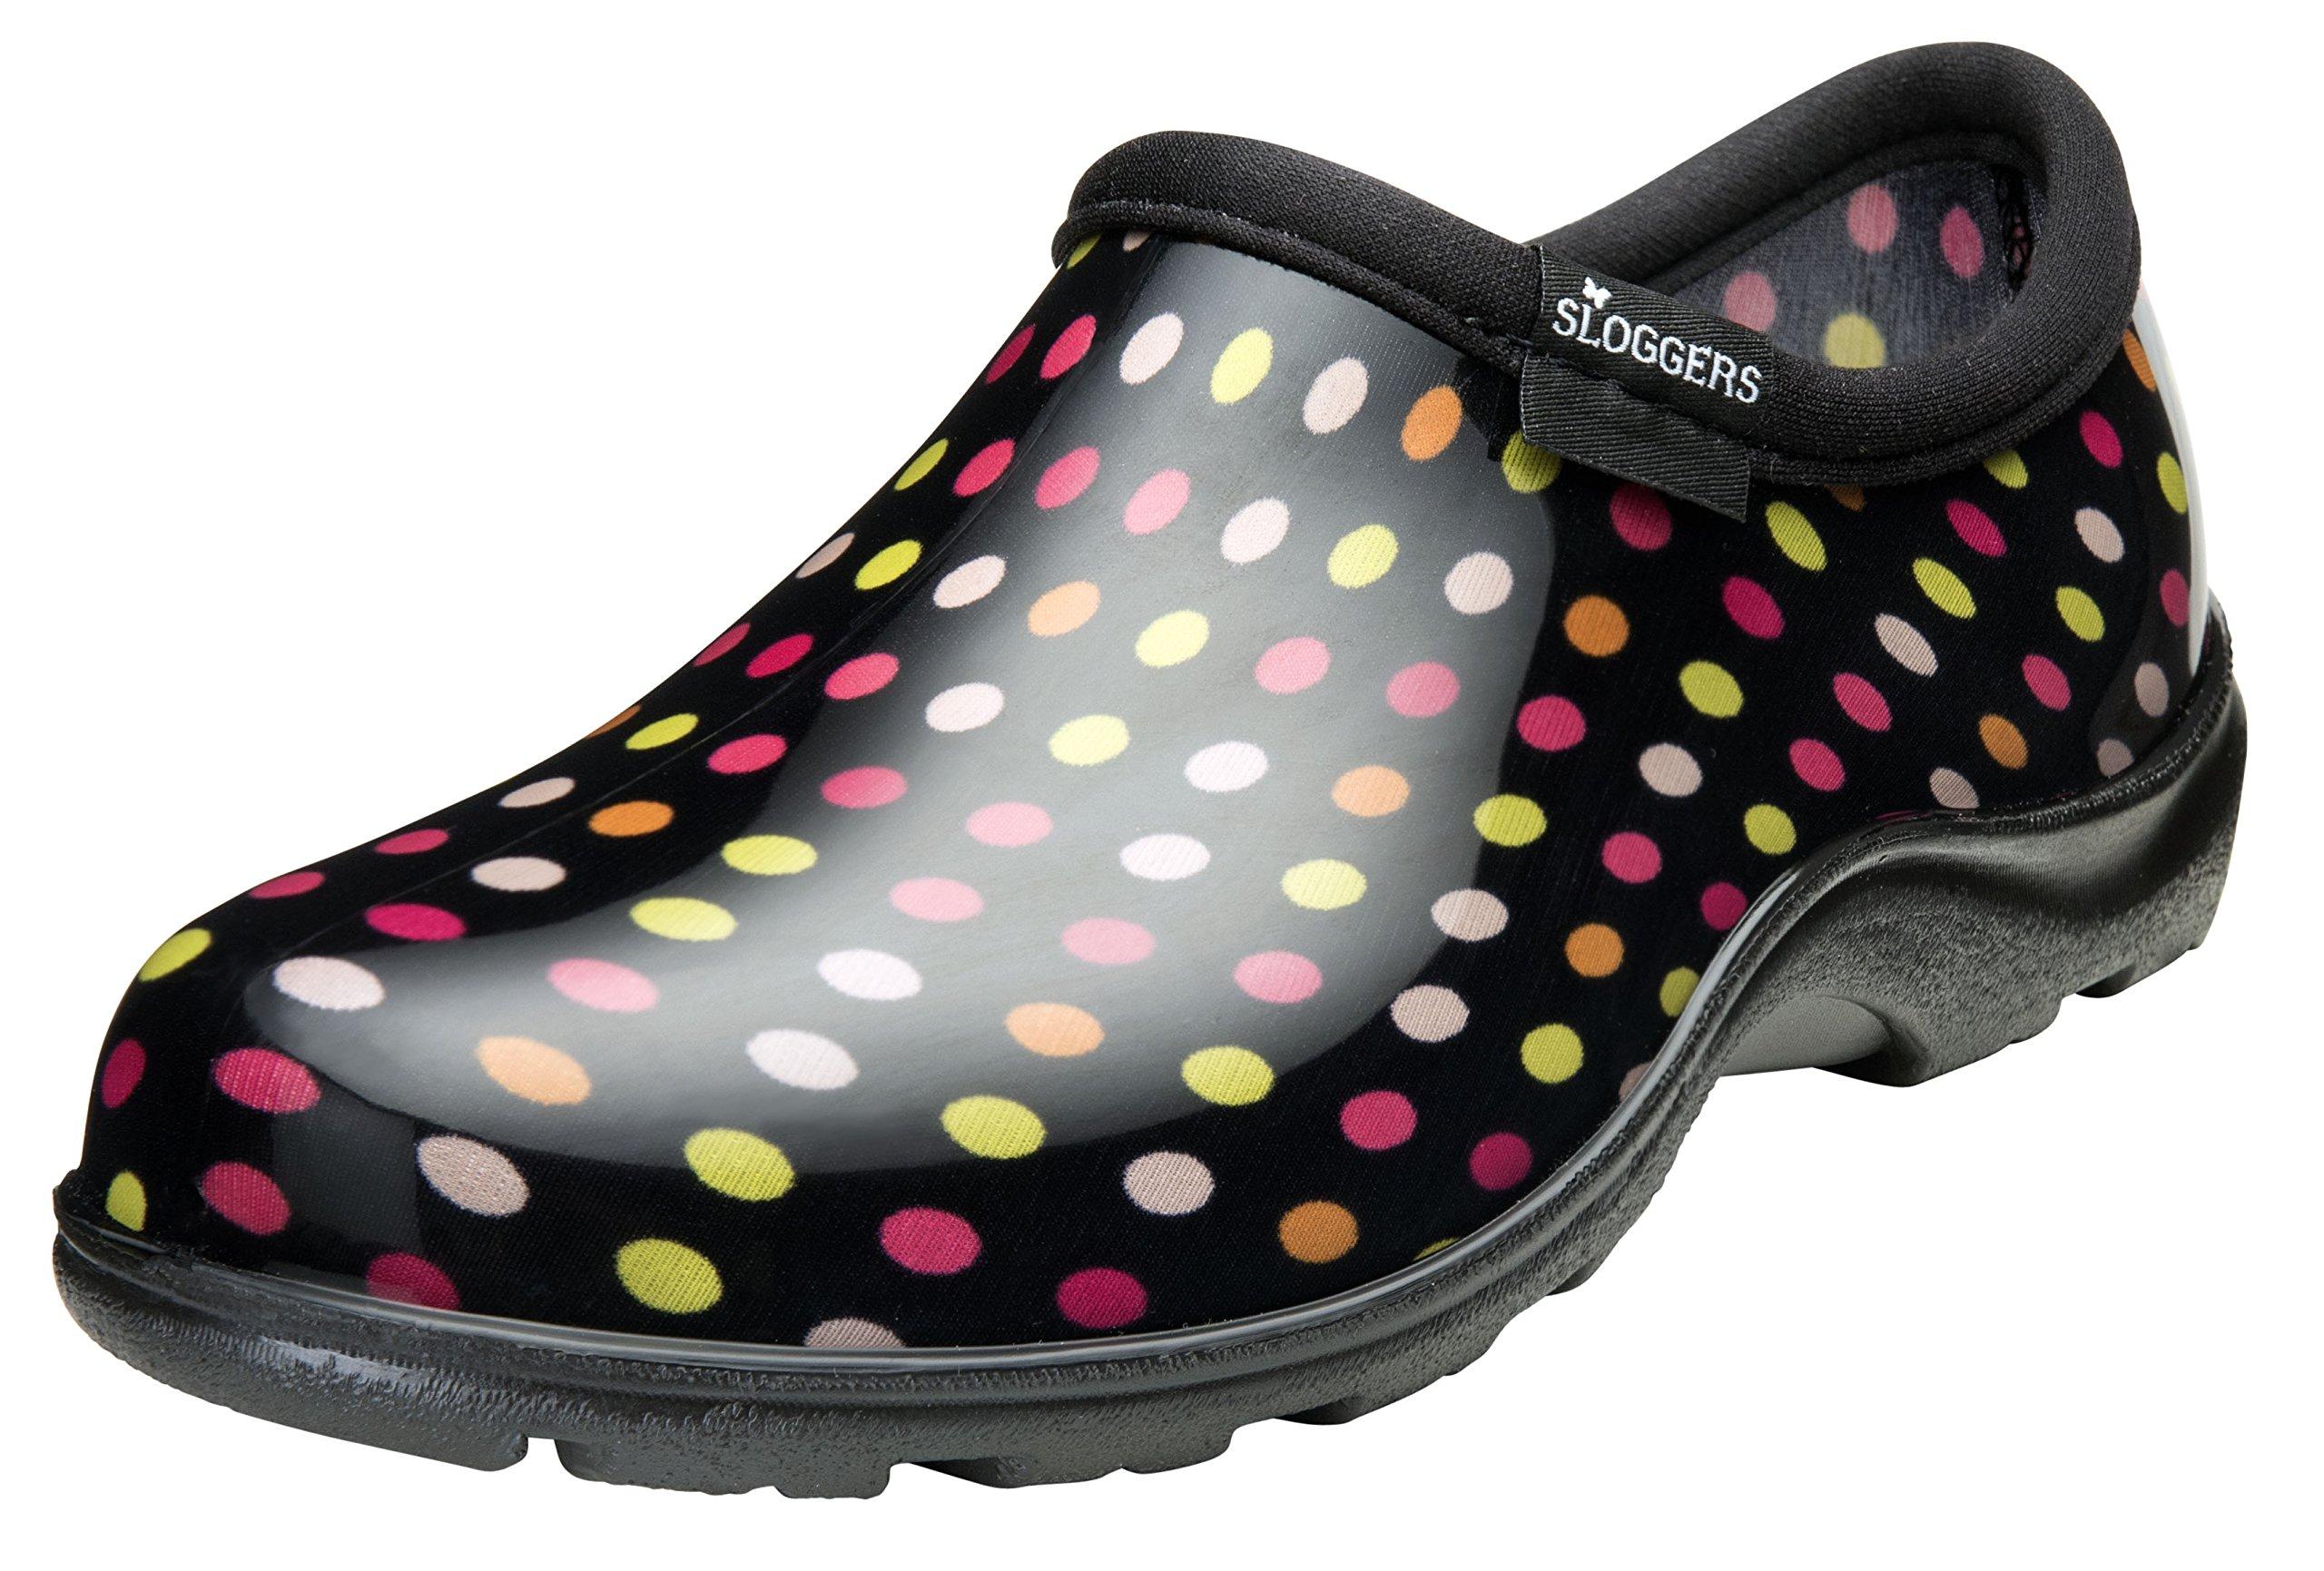 Sloggers Women's Rain and Garden Polka Dot Shoe, Size 11, Multicolor